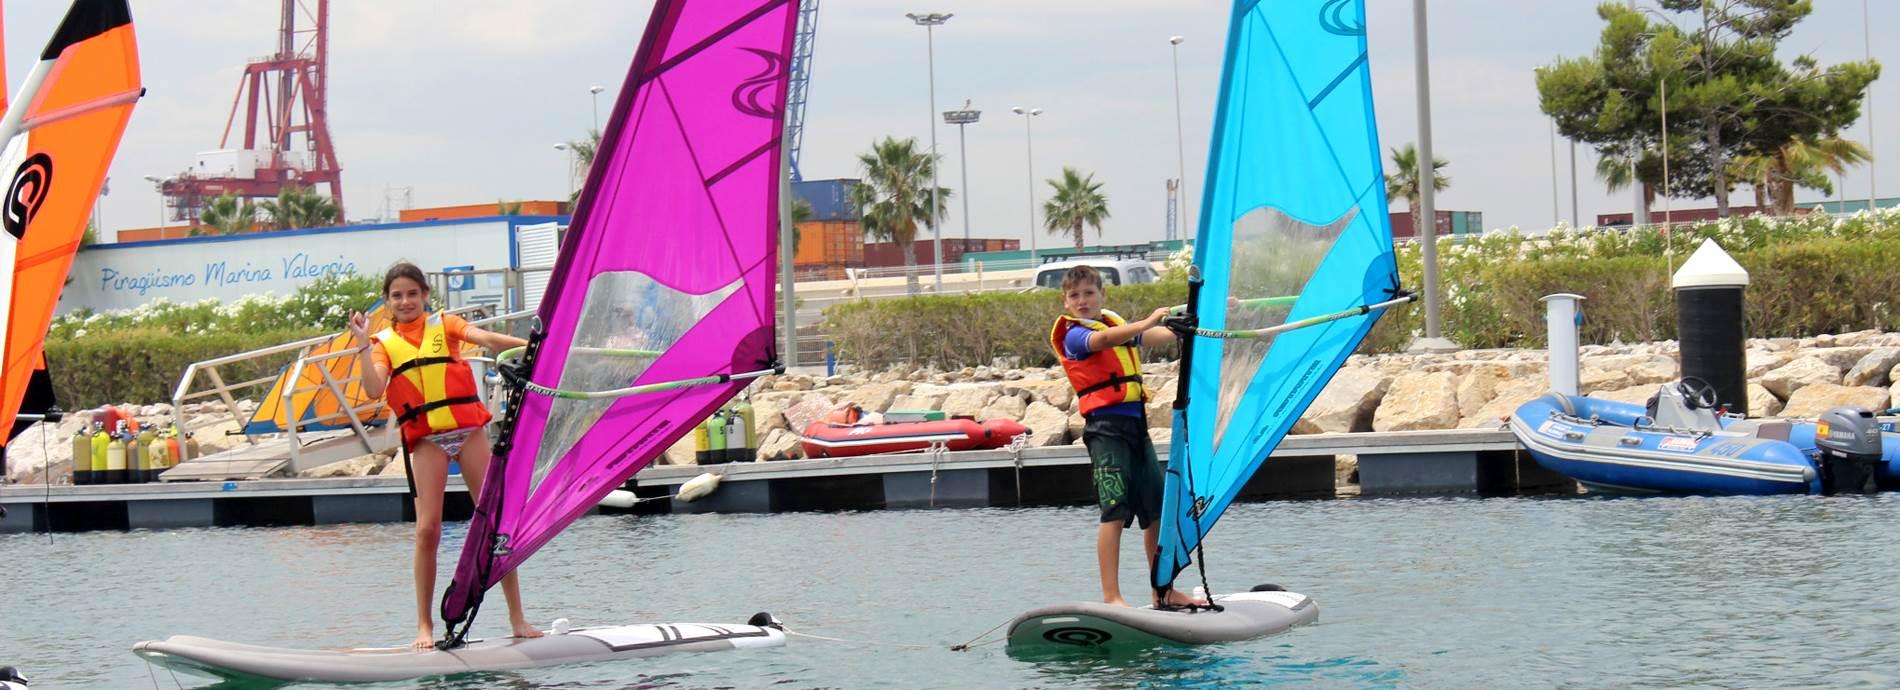 curso windsurf valencia.jpg